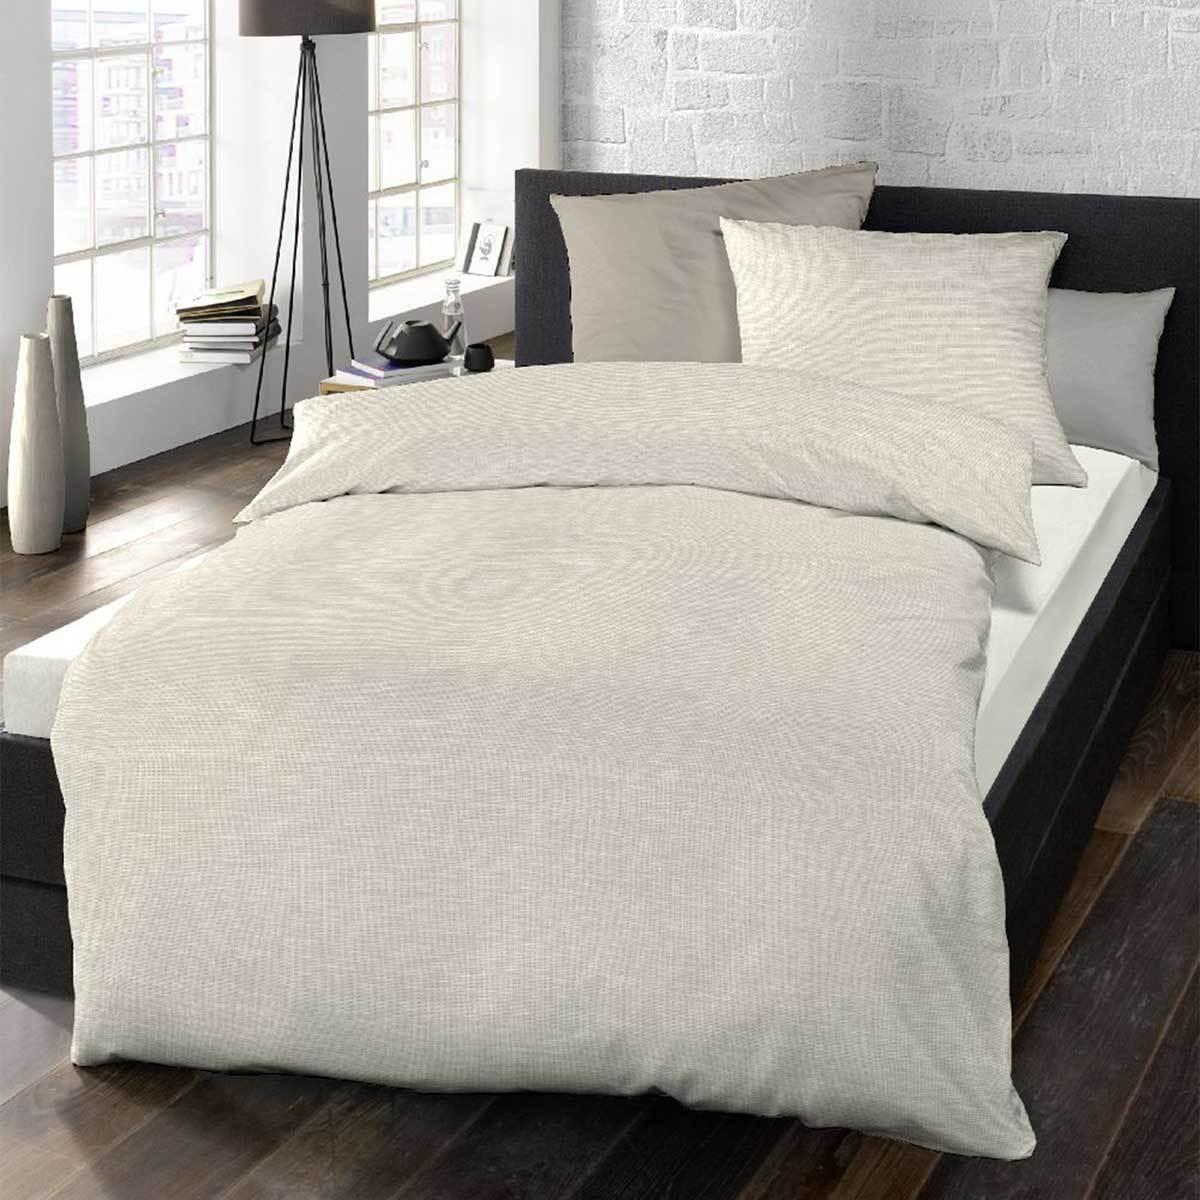 schlafgut mako satin bettw sche lipari kokos g nstig online kaufen bei bettwaren shop. Black Bedroom Furniture Sets. Home Design Ideas